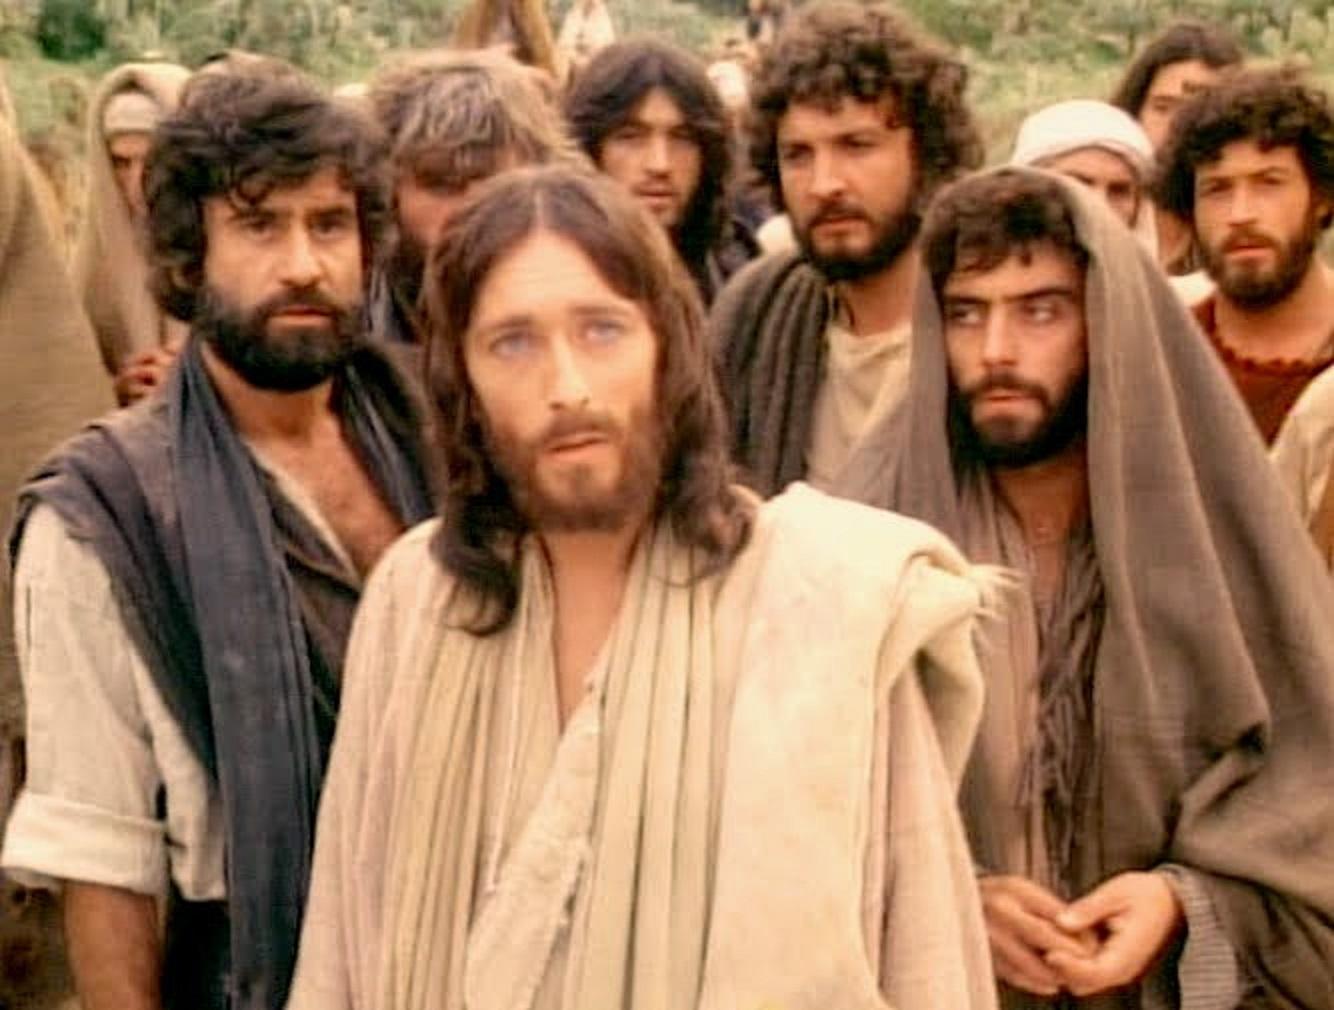 Paroles de Jésus 2017 1.jpg